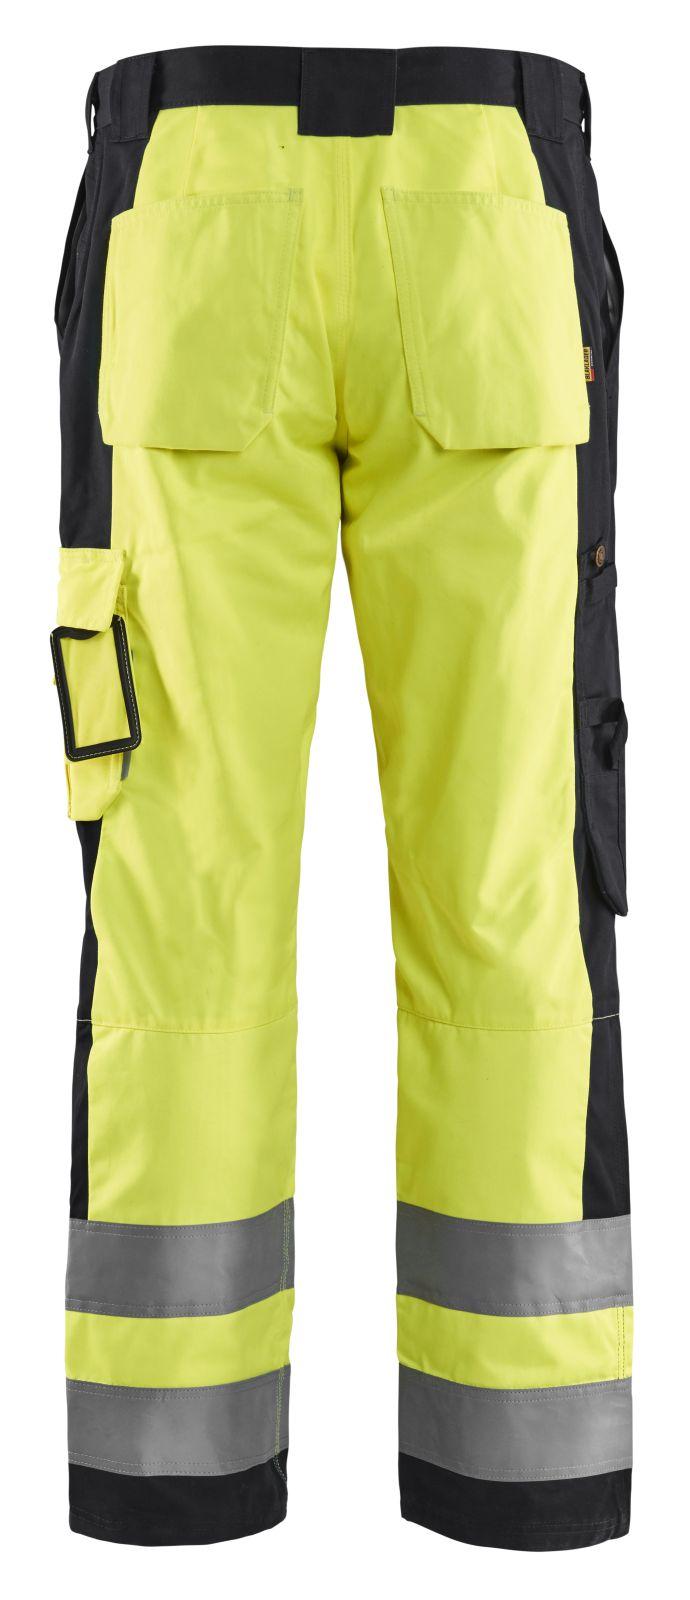 Blaklader Werkbroeken 15831860 High Vis geel-zwart(3399)